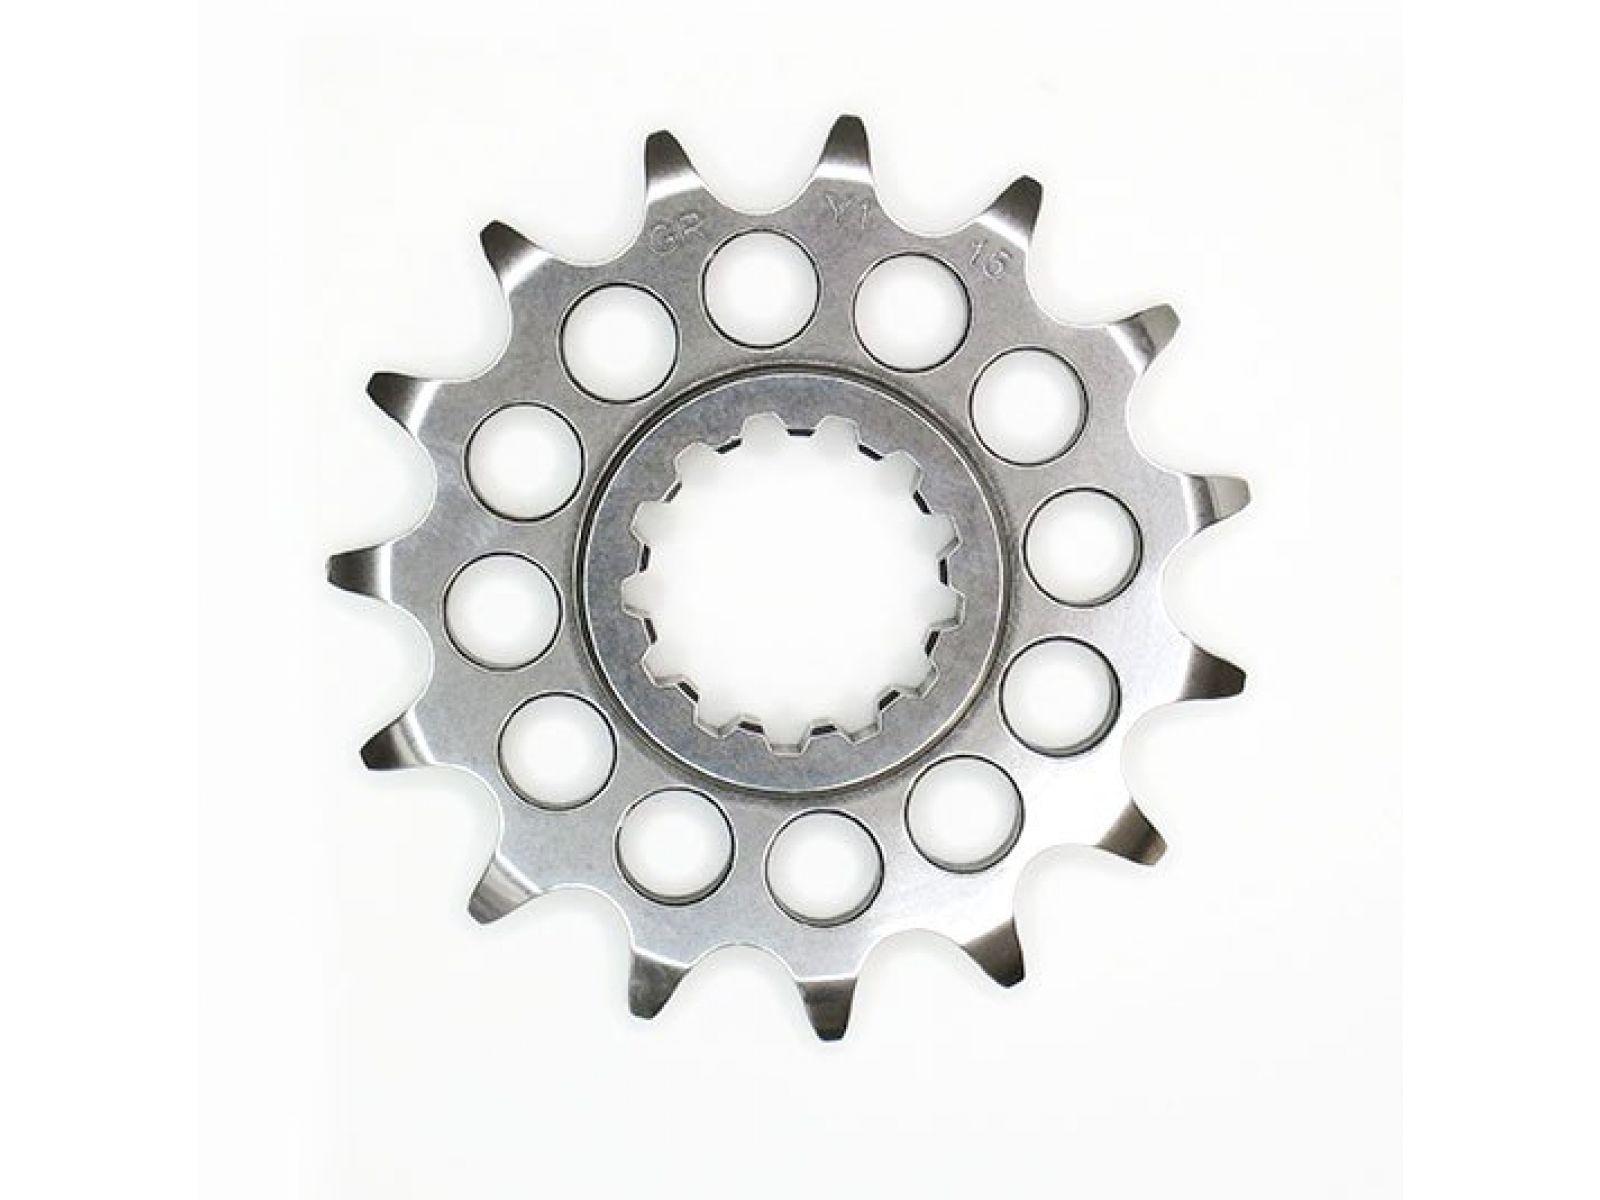 Звезда передняя GANDINI для Yamaha R1 98-18, R1M 16-18, Suzuki GSXR600 11-17, GSXR750 11-17